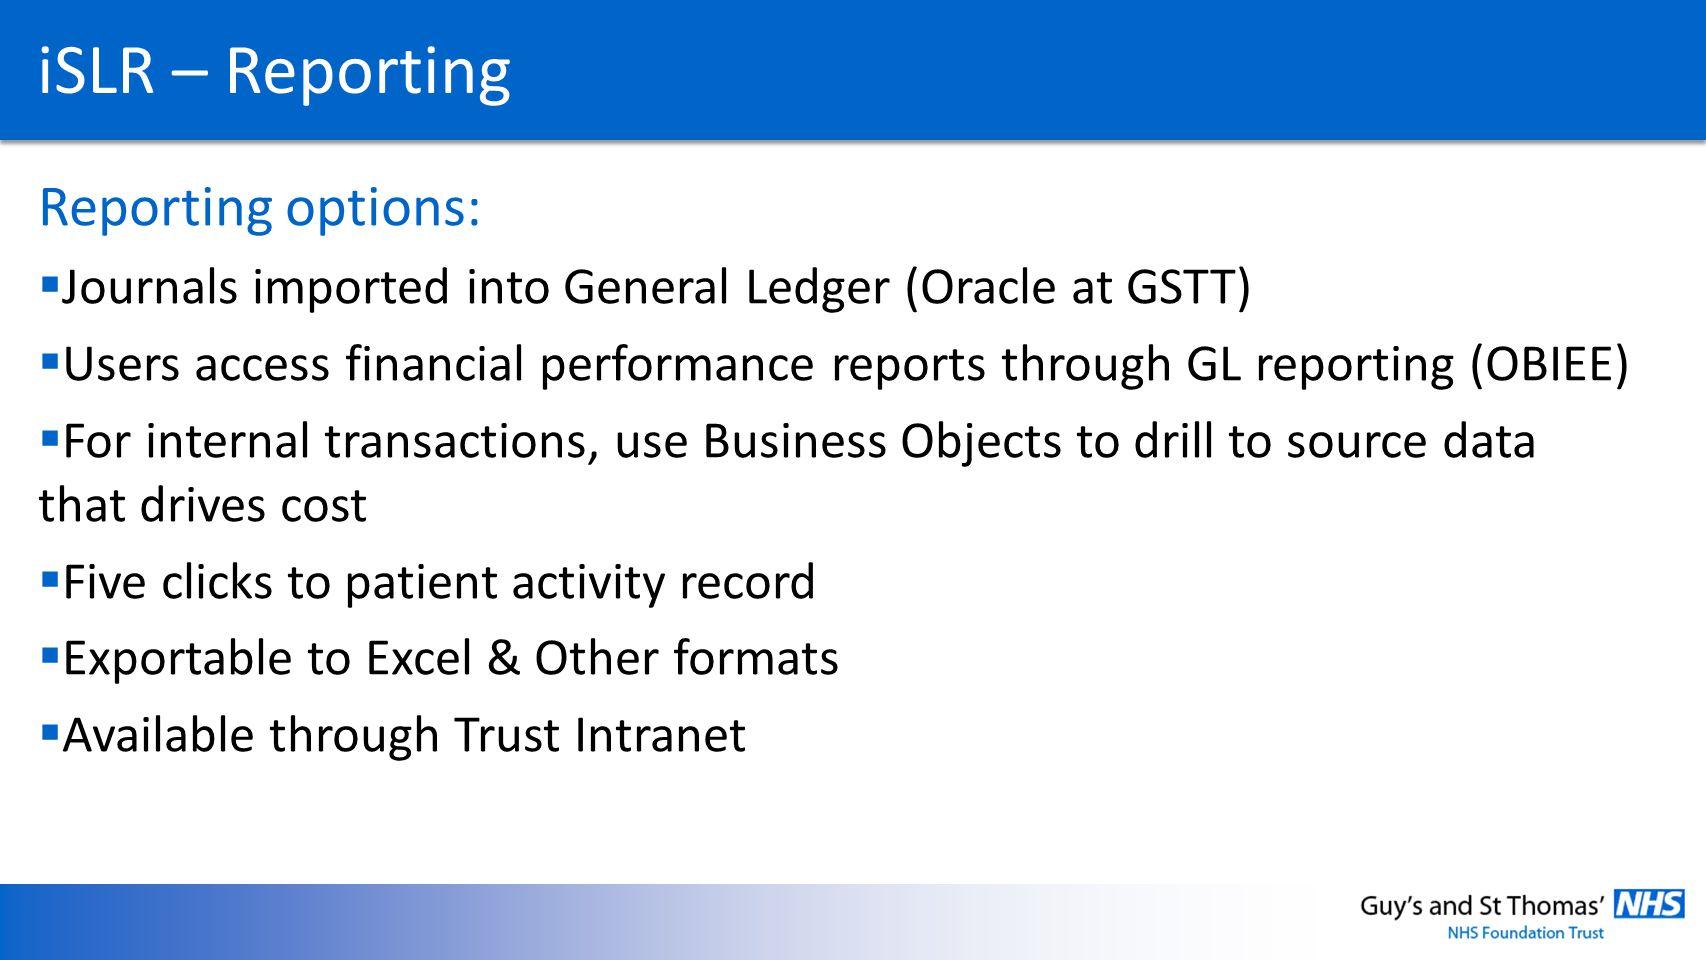 iSLR – Reporting Reporting options: